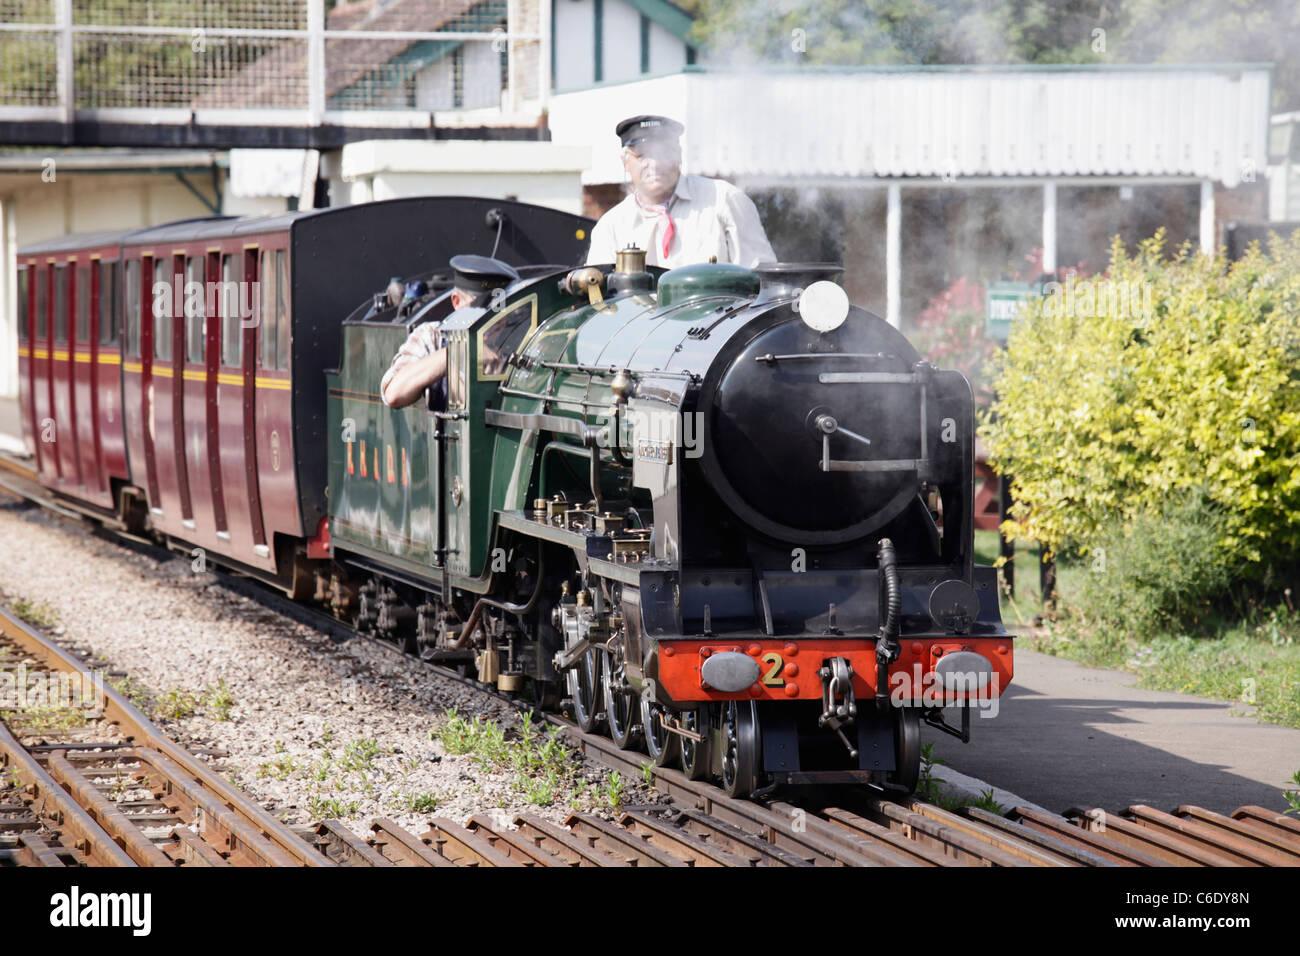 steam-train-of-romney-hythe-dymchurch-ra